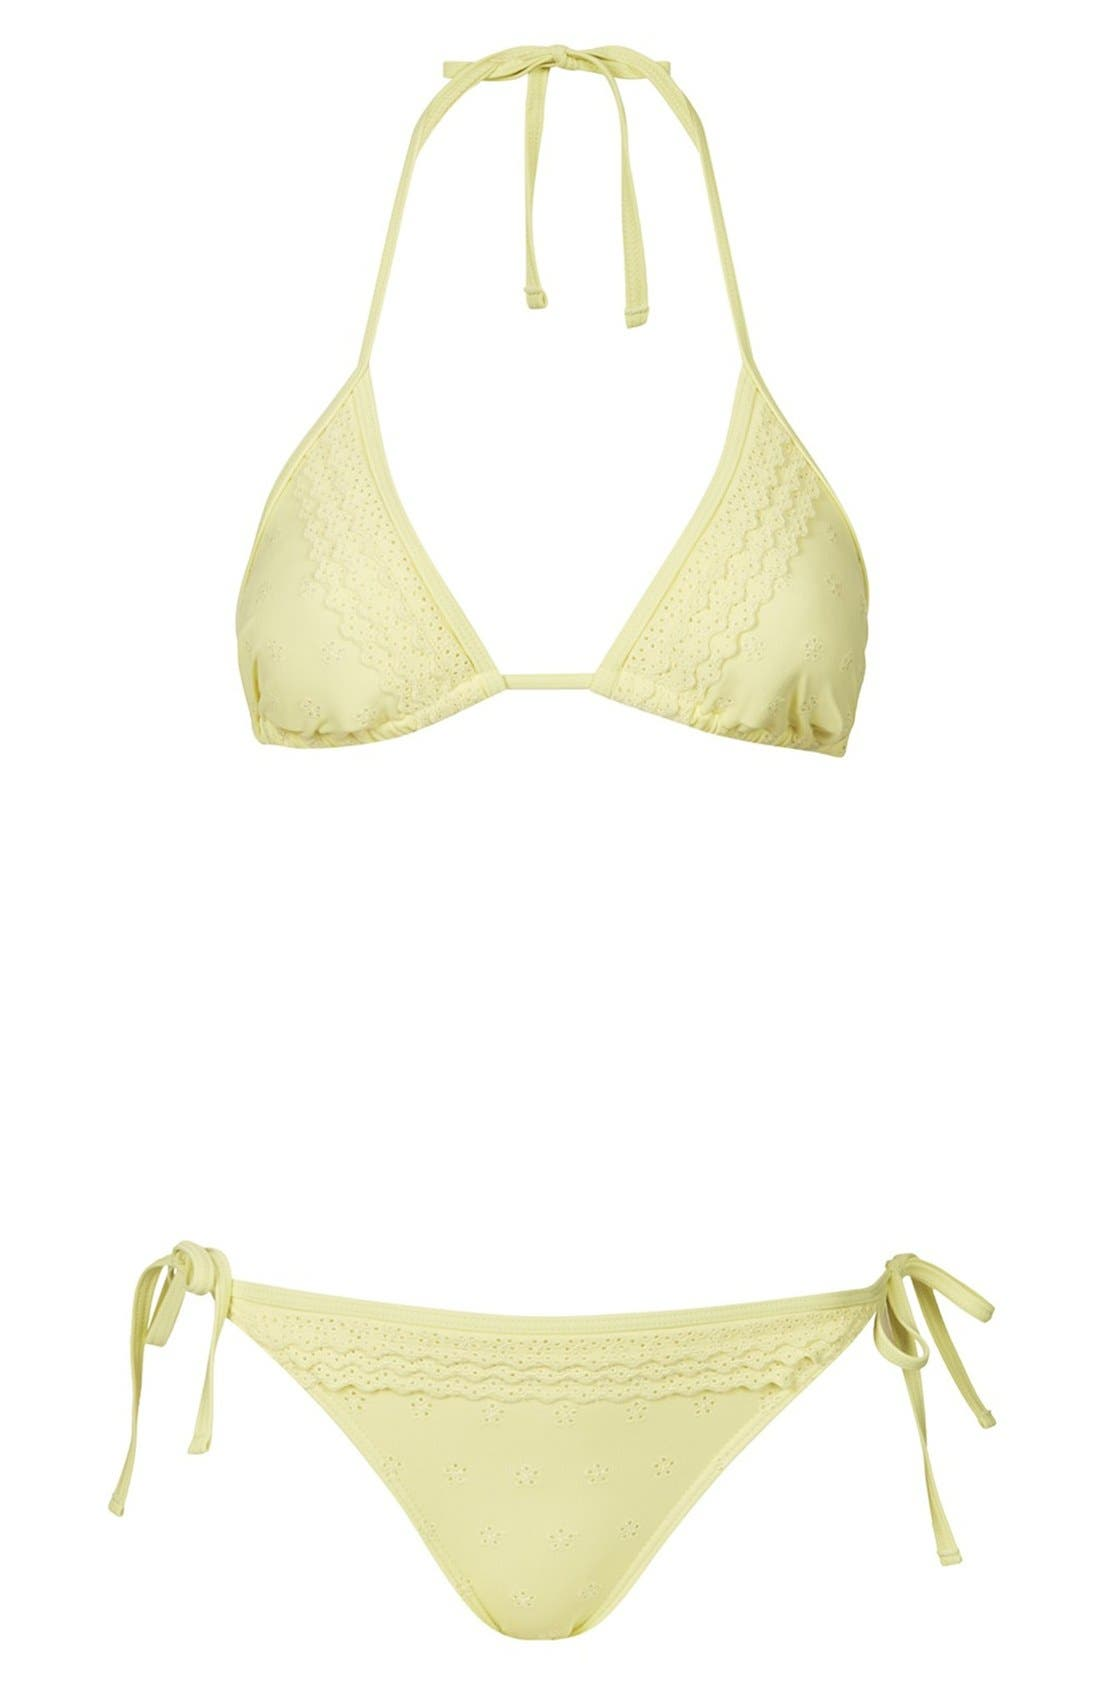 Alternate Image 1 Selected - Topshop 'Broderie Frill' Eyelet Bikini